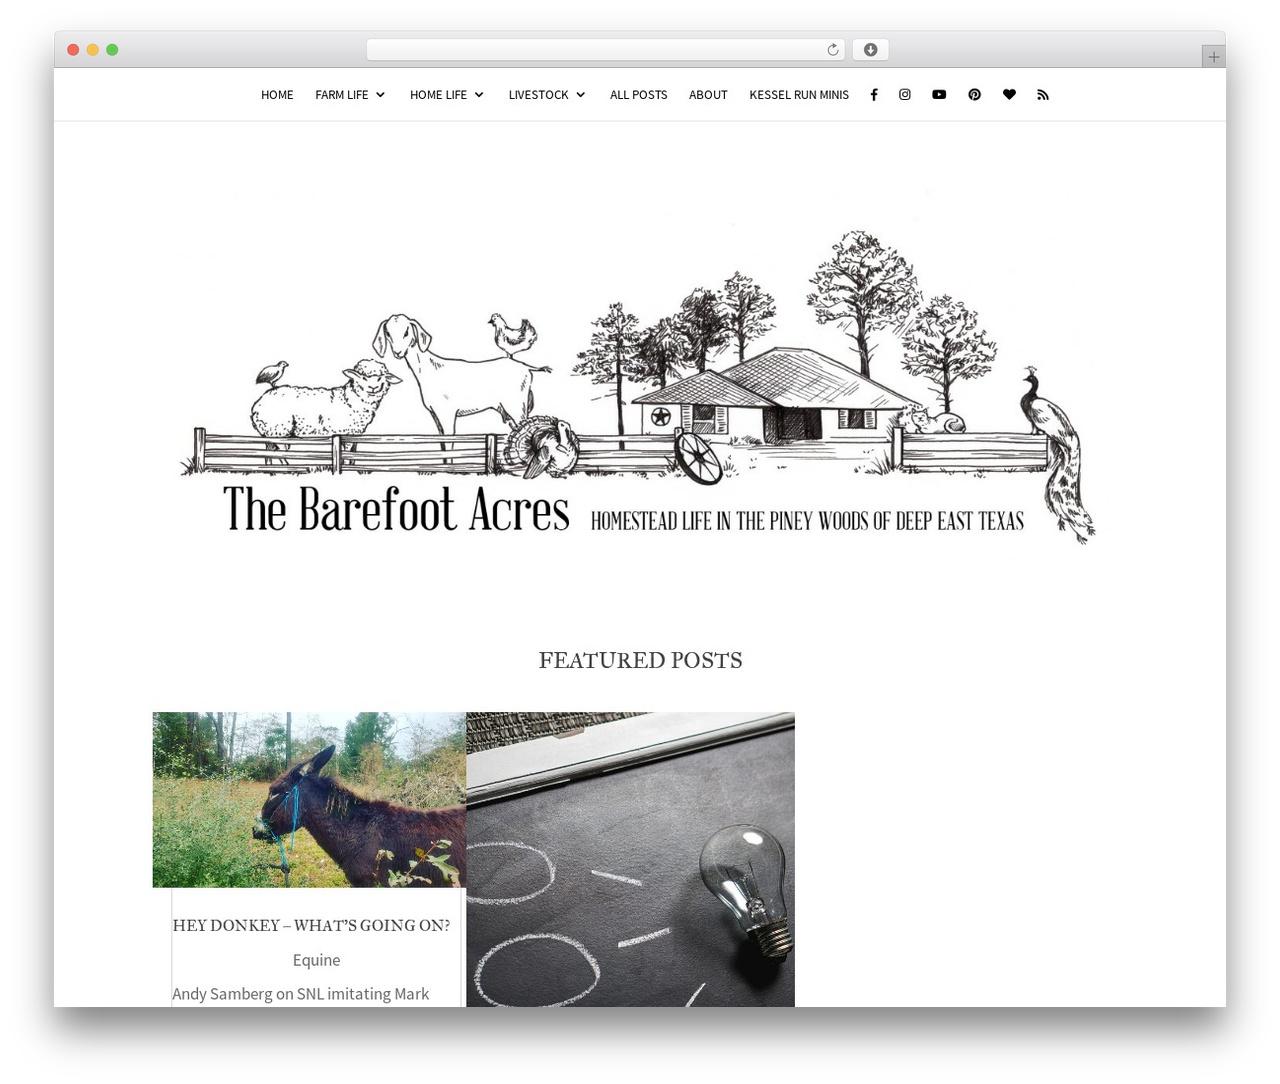 Template WordPress Divi - thebarefootacres.com